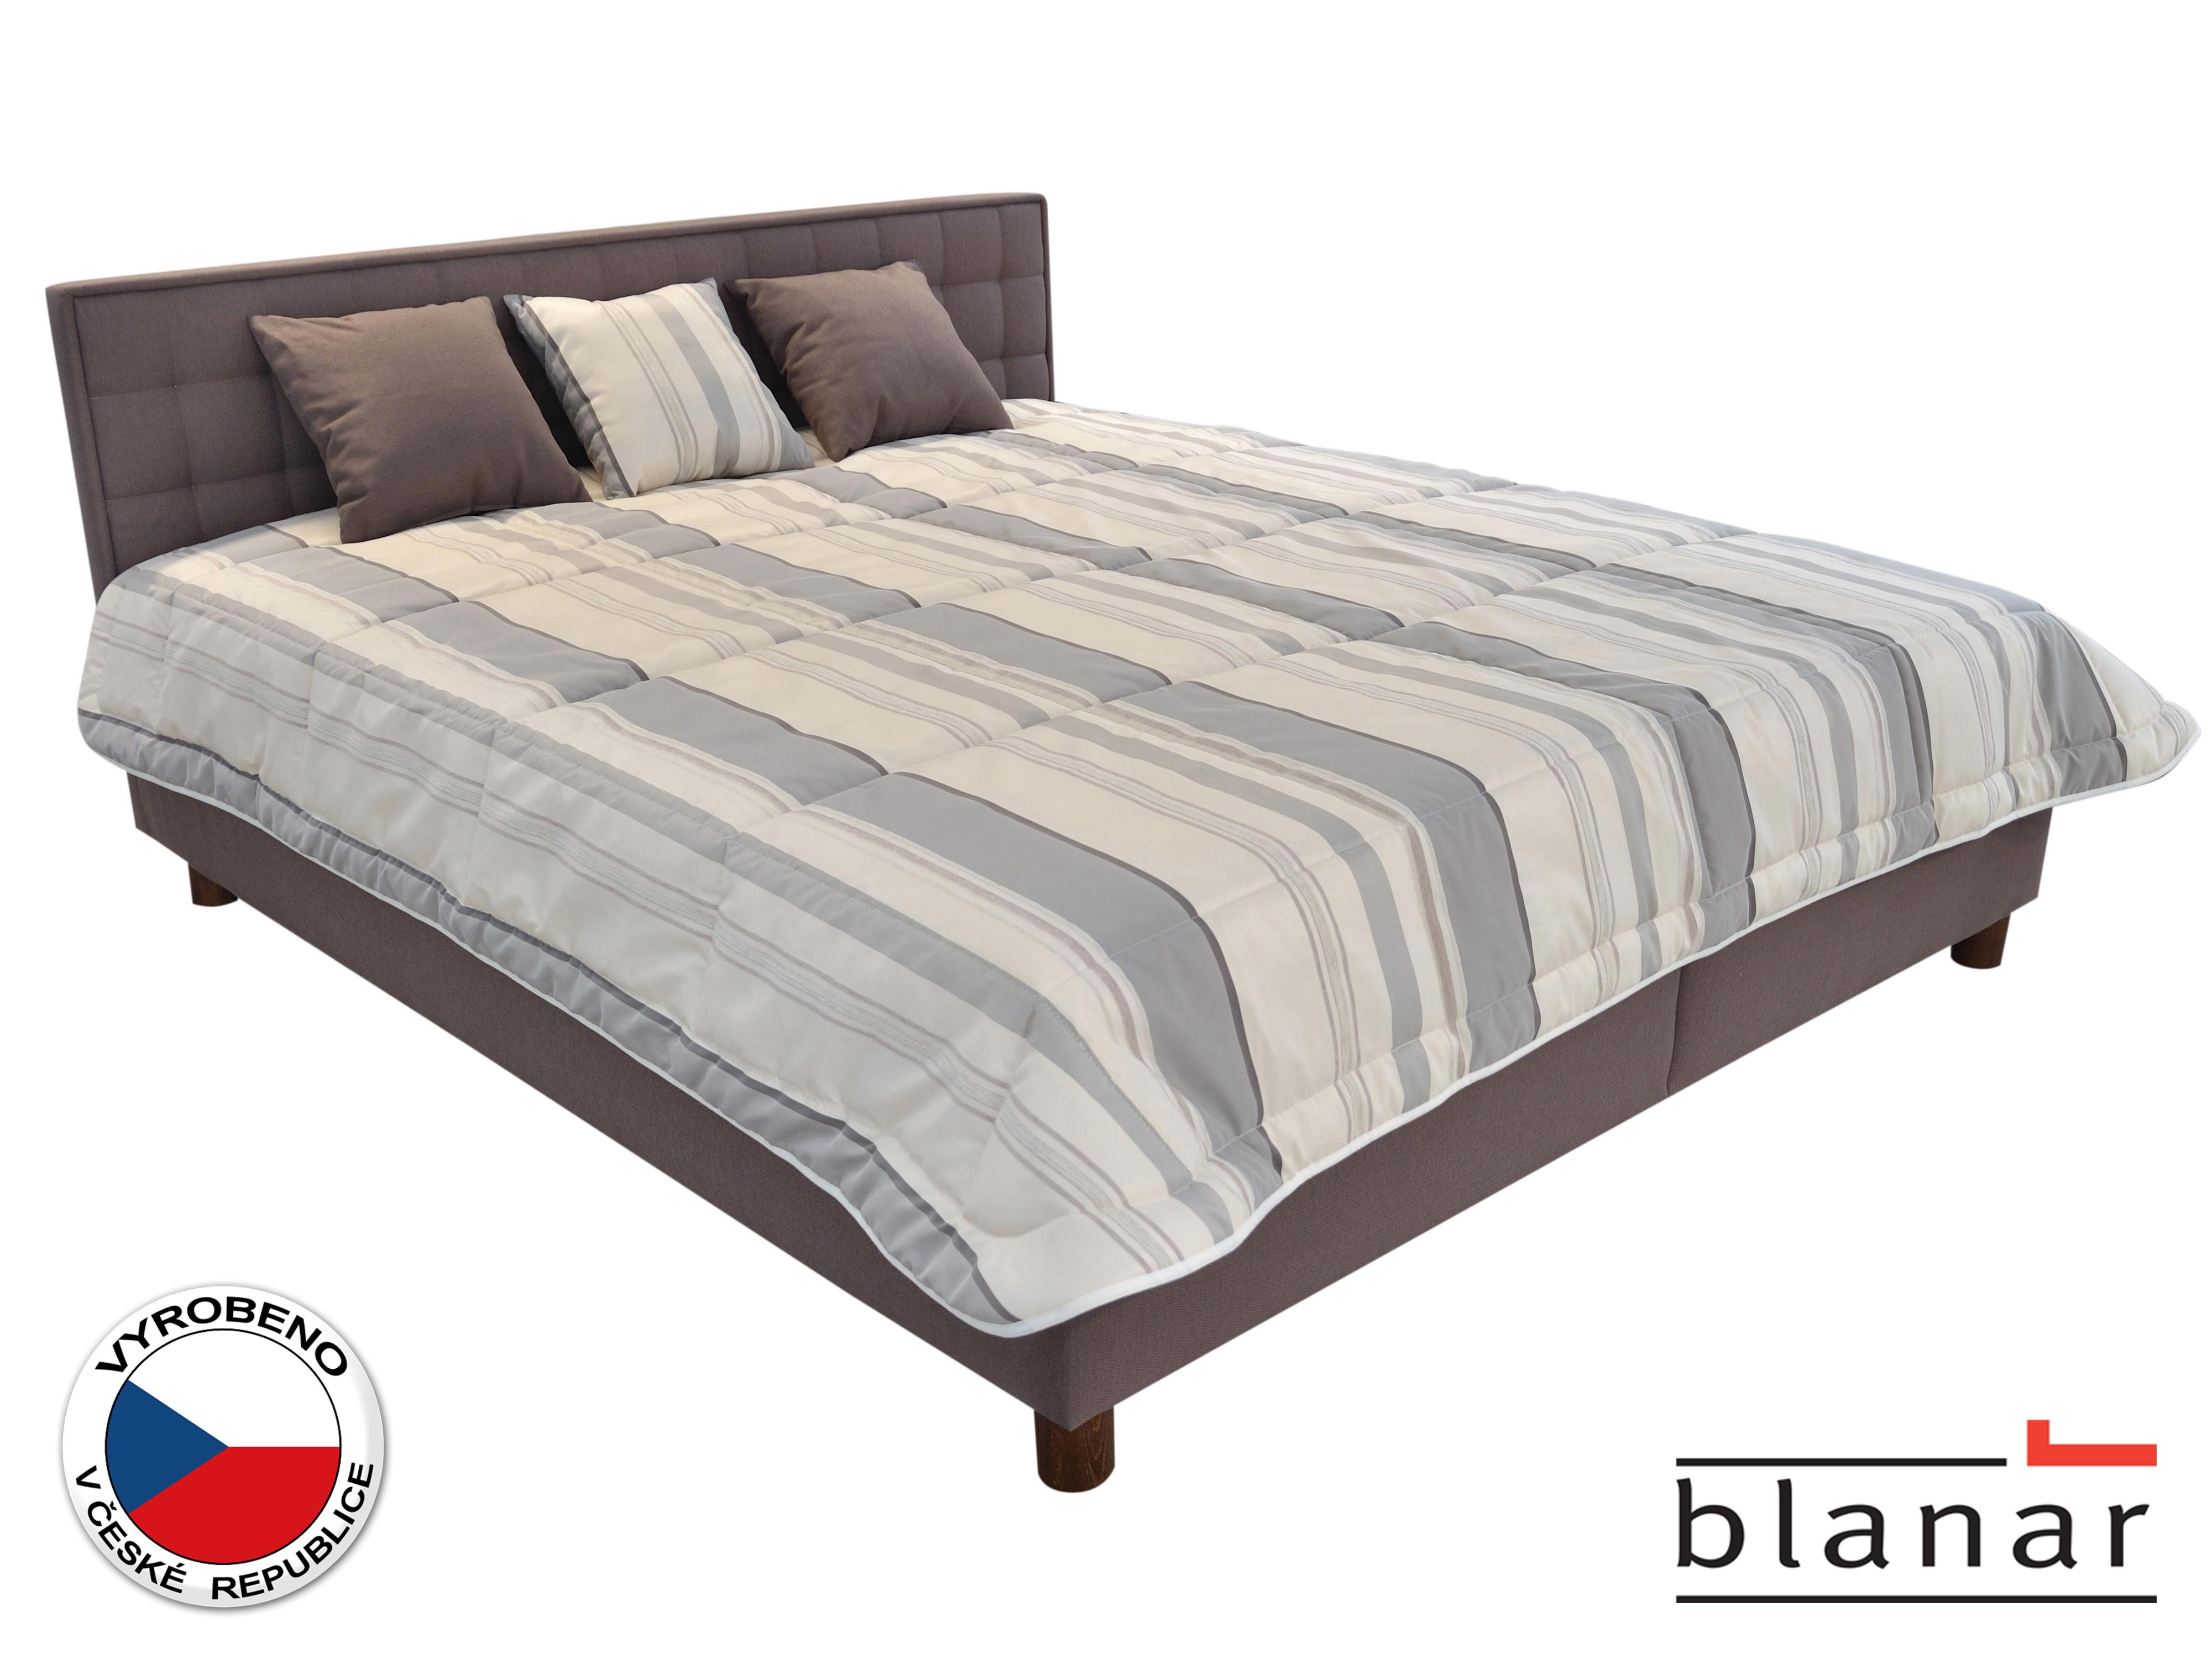 Manželská postel 160 cm - Blanár - Bobby (s roštem a matracemi) (bílá + šedá)